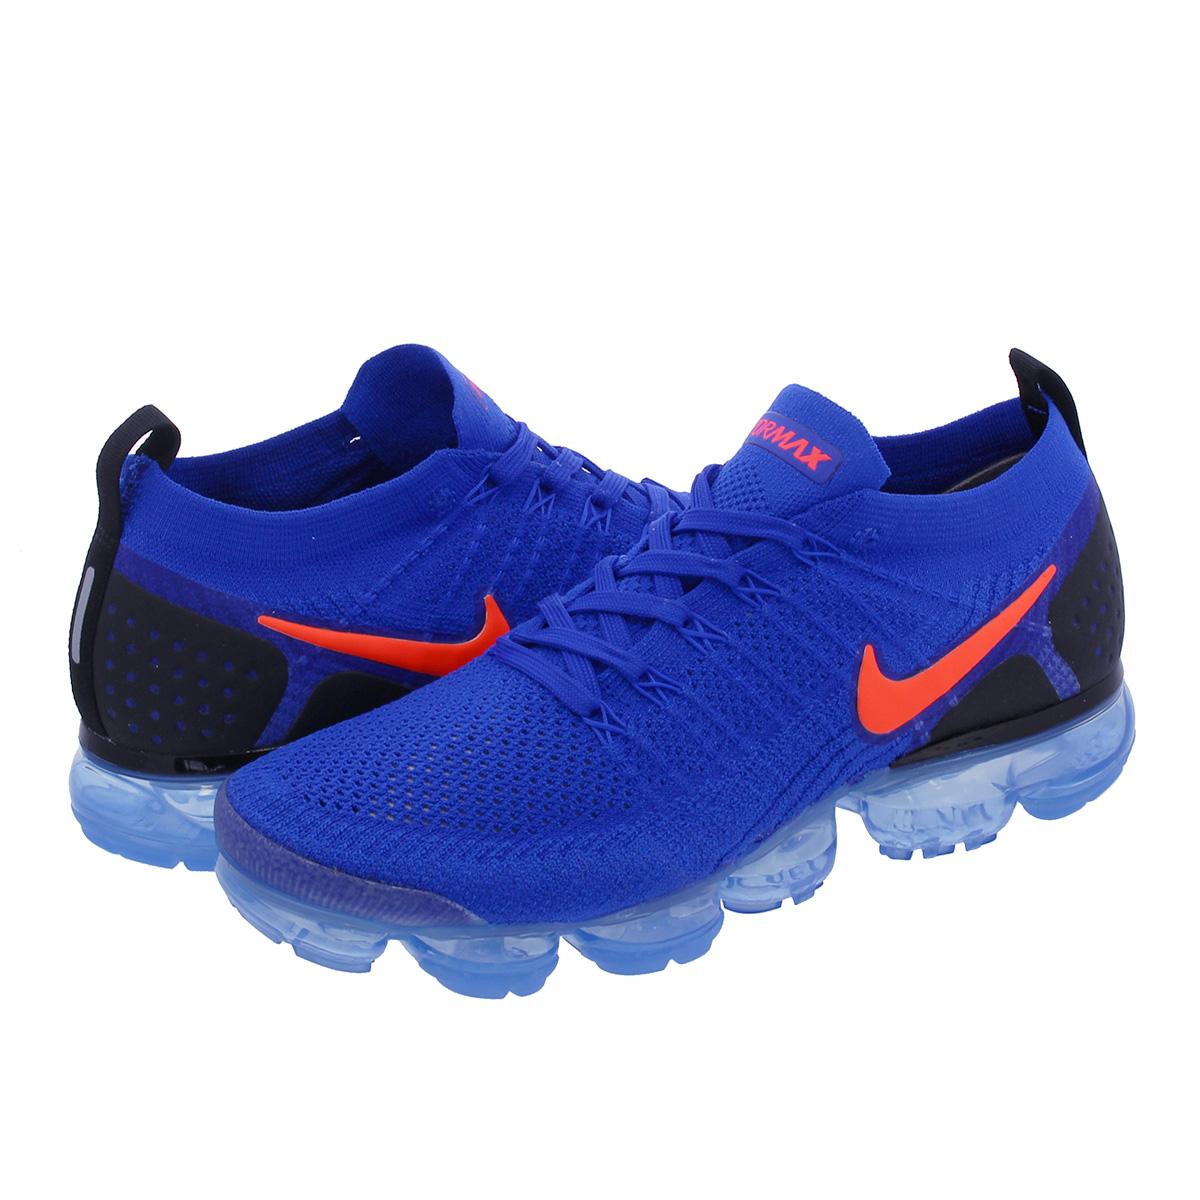 wholesale dealer 52117 2d255 NIKE AIR VAPORMAX FLYKNIT 2 Nike vapor max fried food knit 2 RACER  BLUE/TOTAL CRIMSON/BLACK 942,842-400